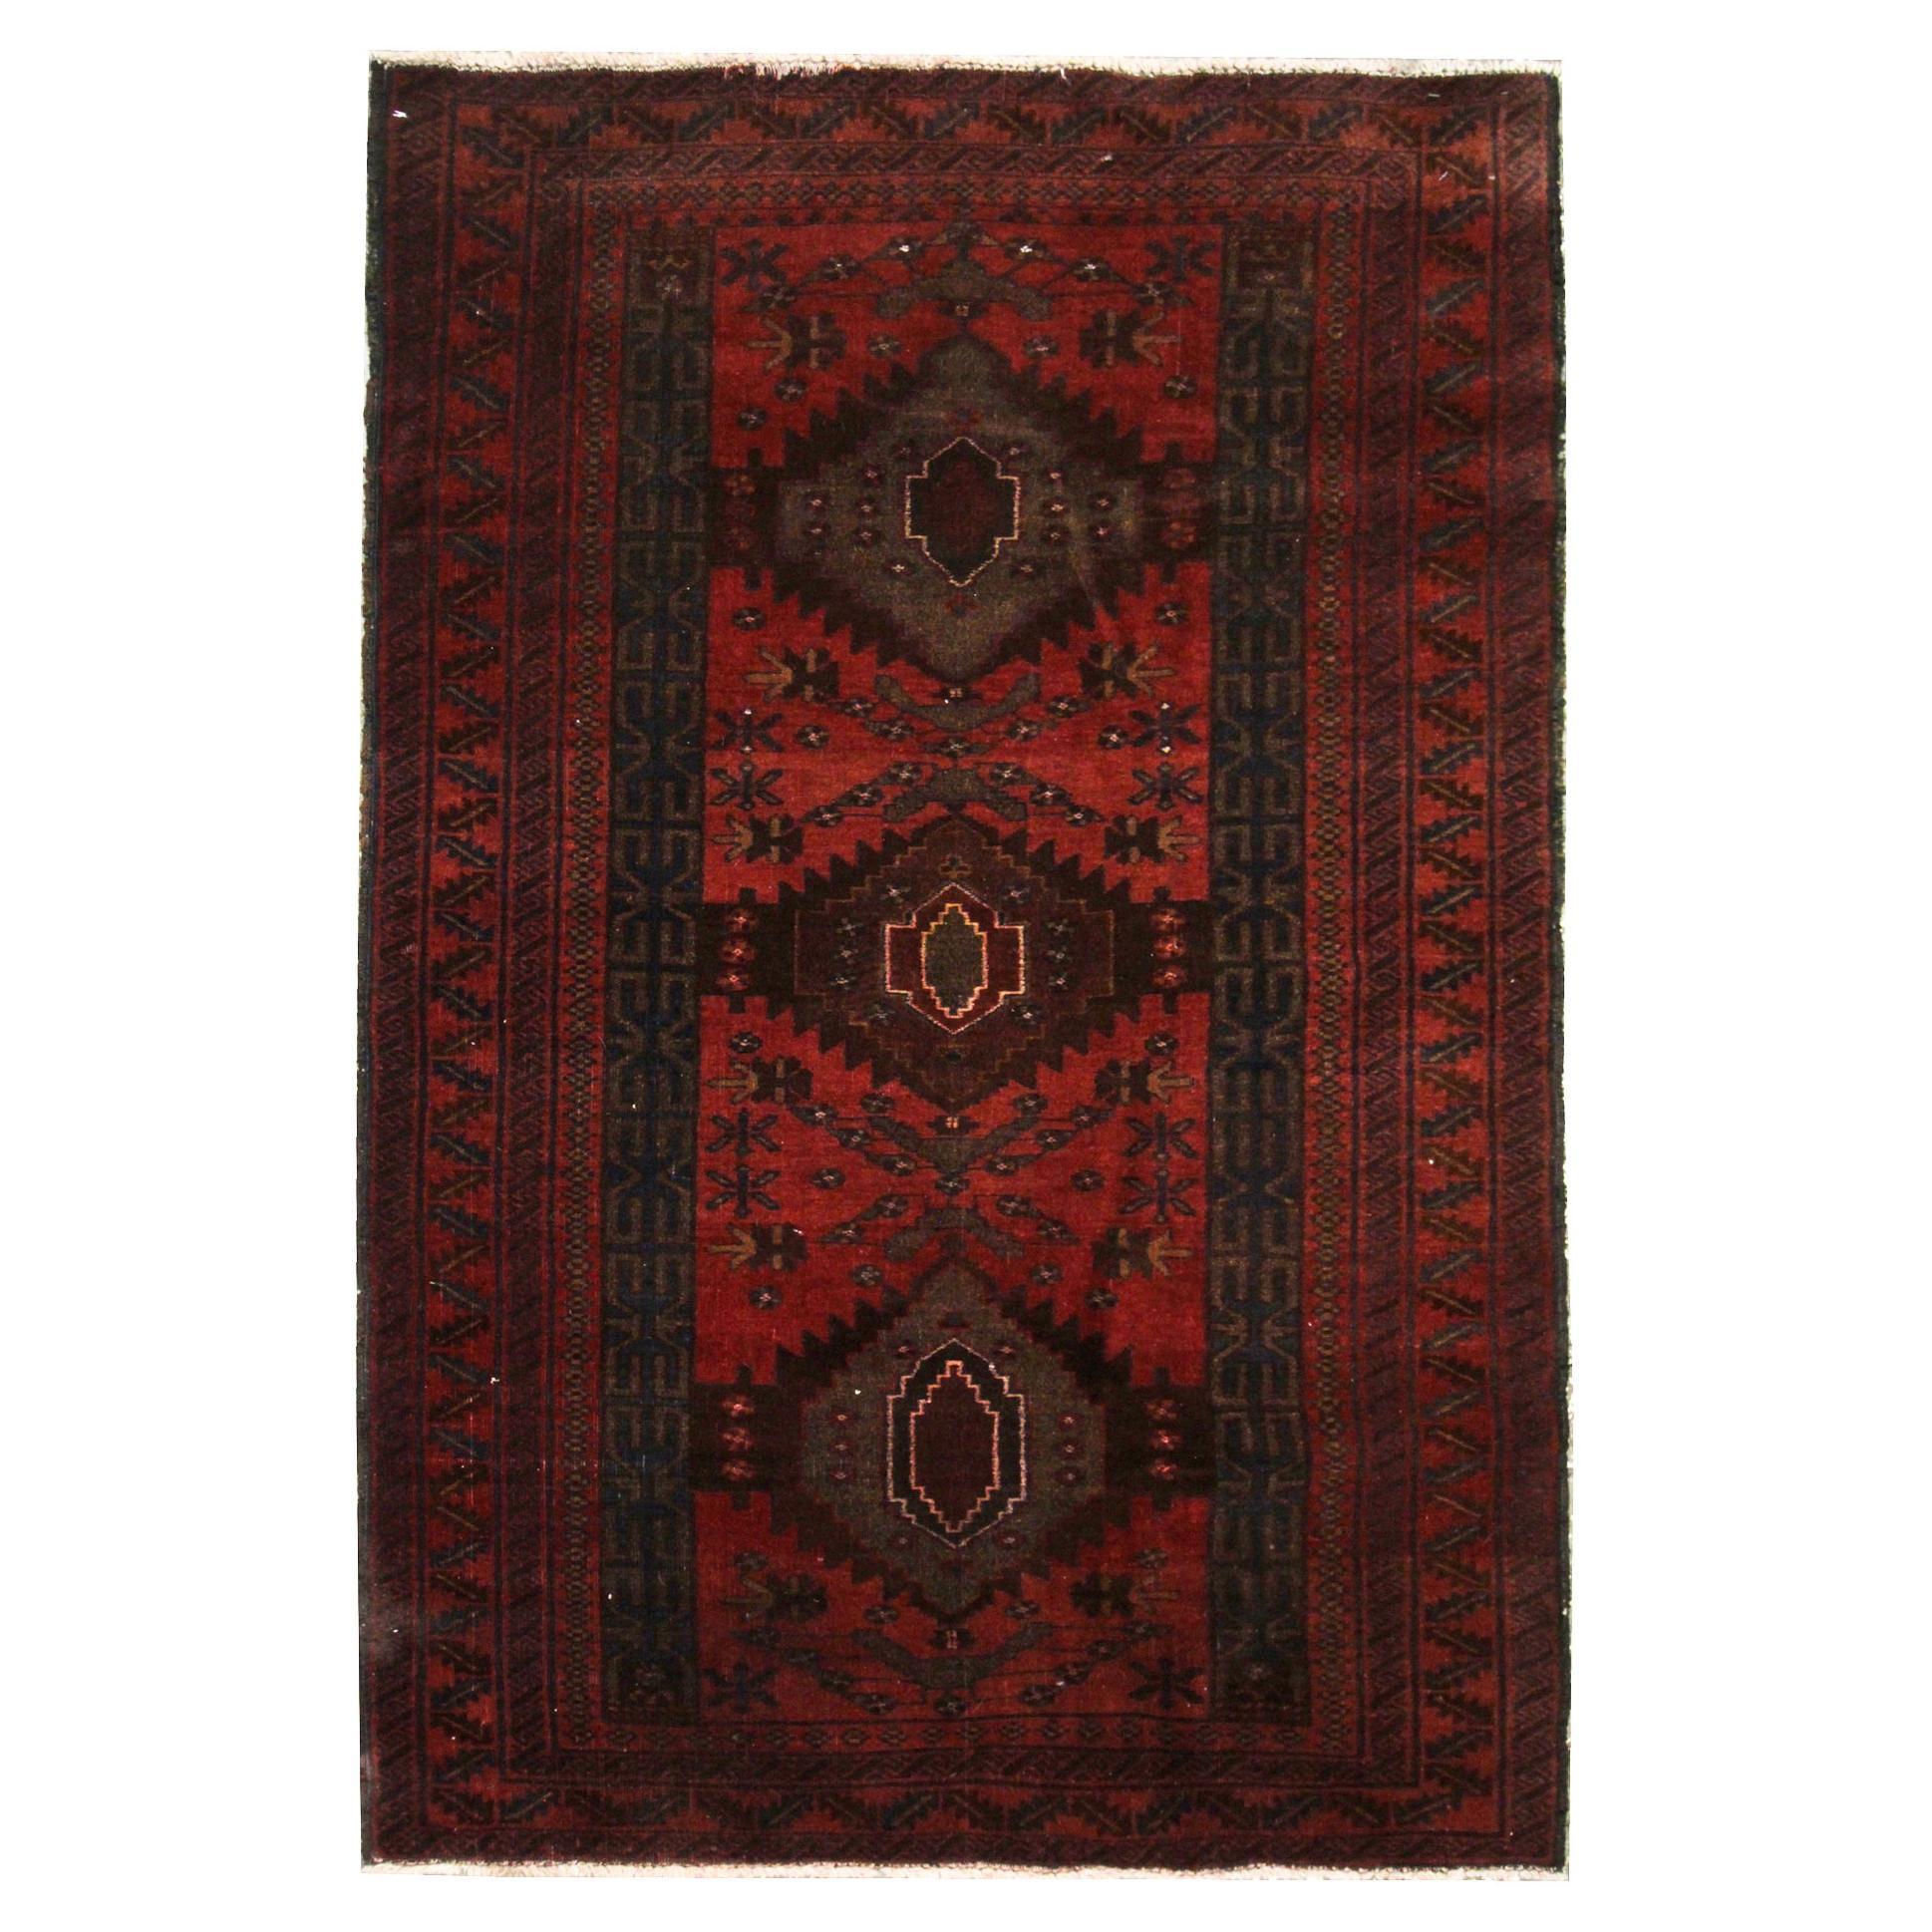 Handmade Rug Vintage Afghan Rug, Traditional Oriental Area Carpet